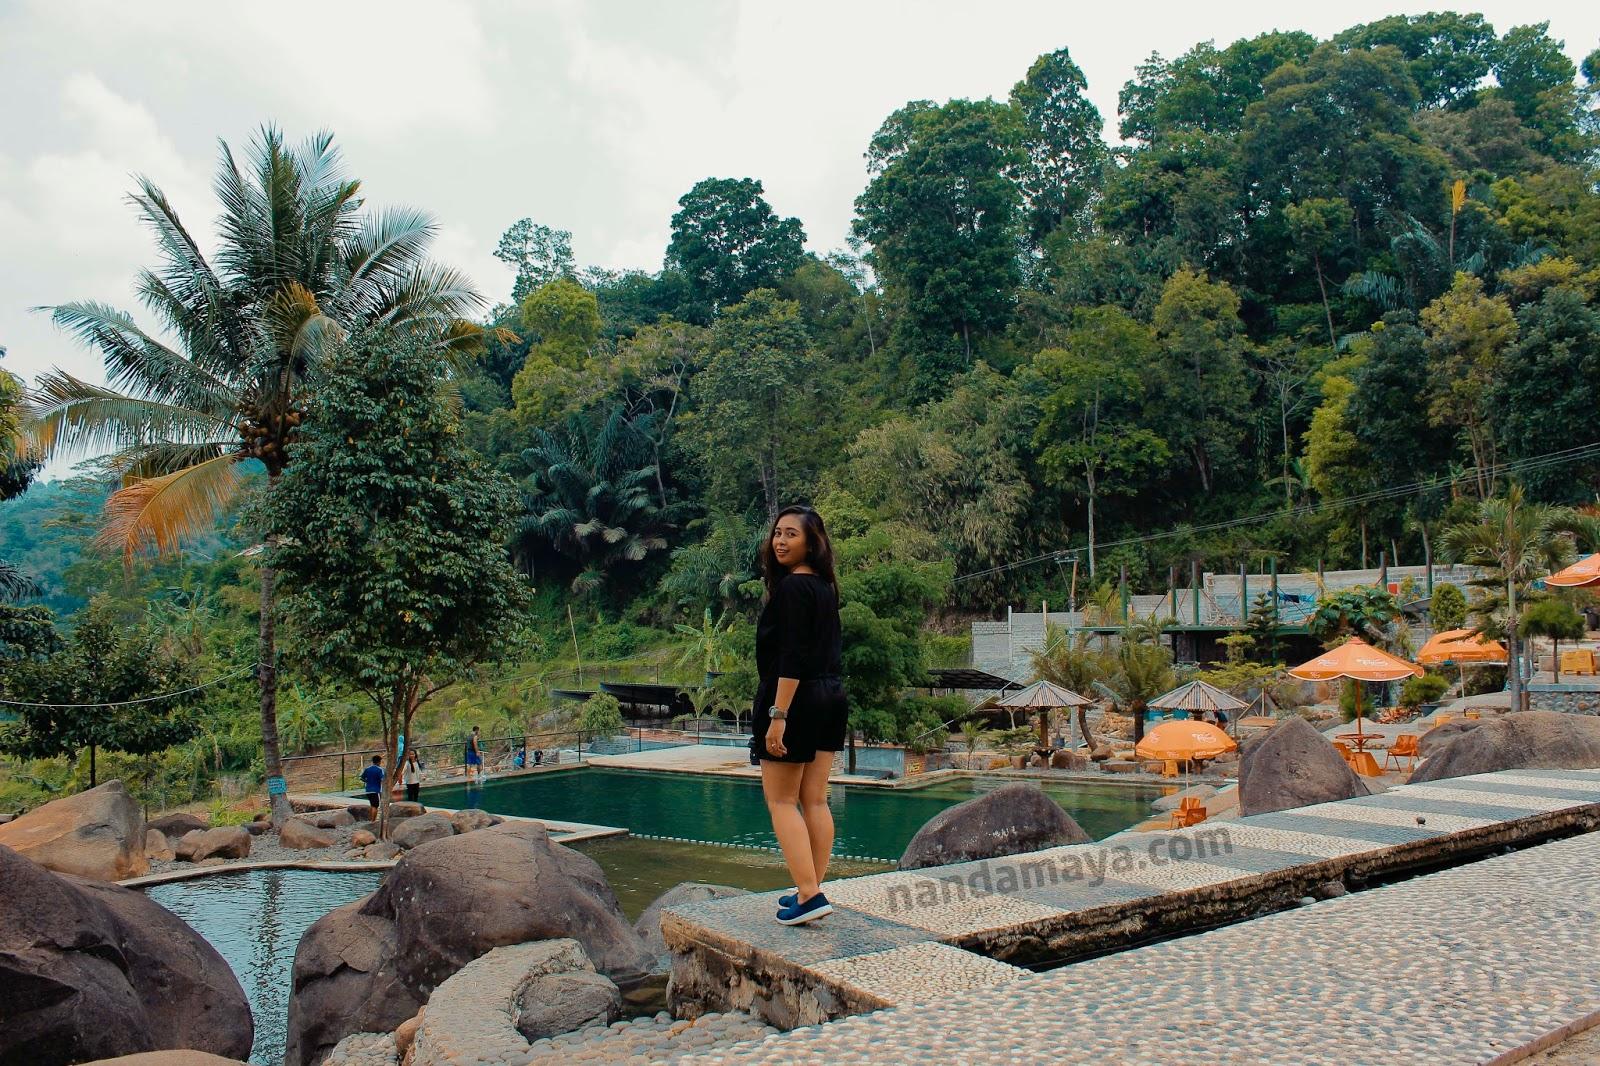 wisata alam taman batu kabupaten purwakarta jawa barat Taman Batu Cijanun Sejuk Dan Nyaman Banget